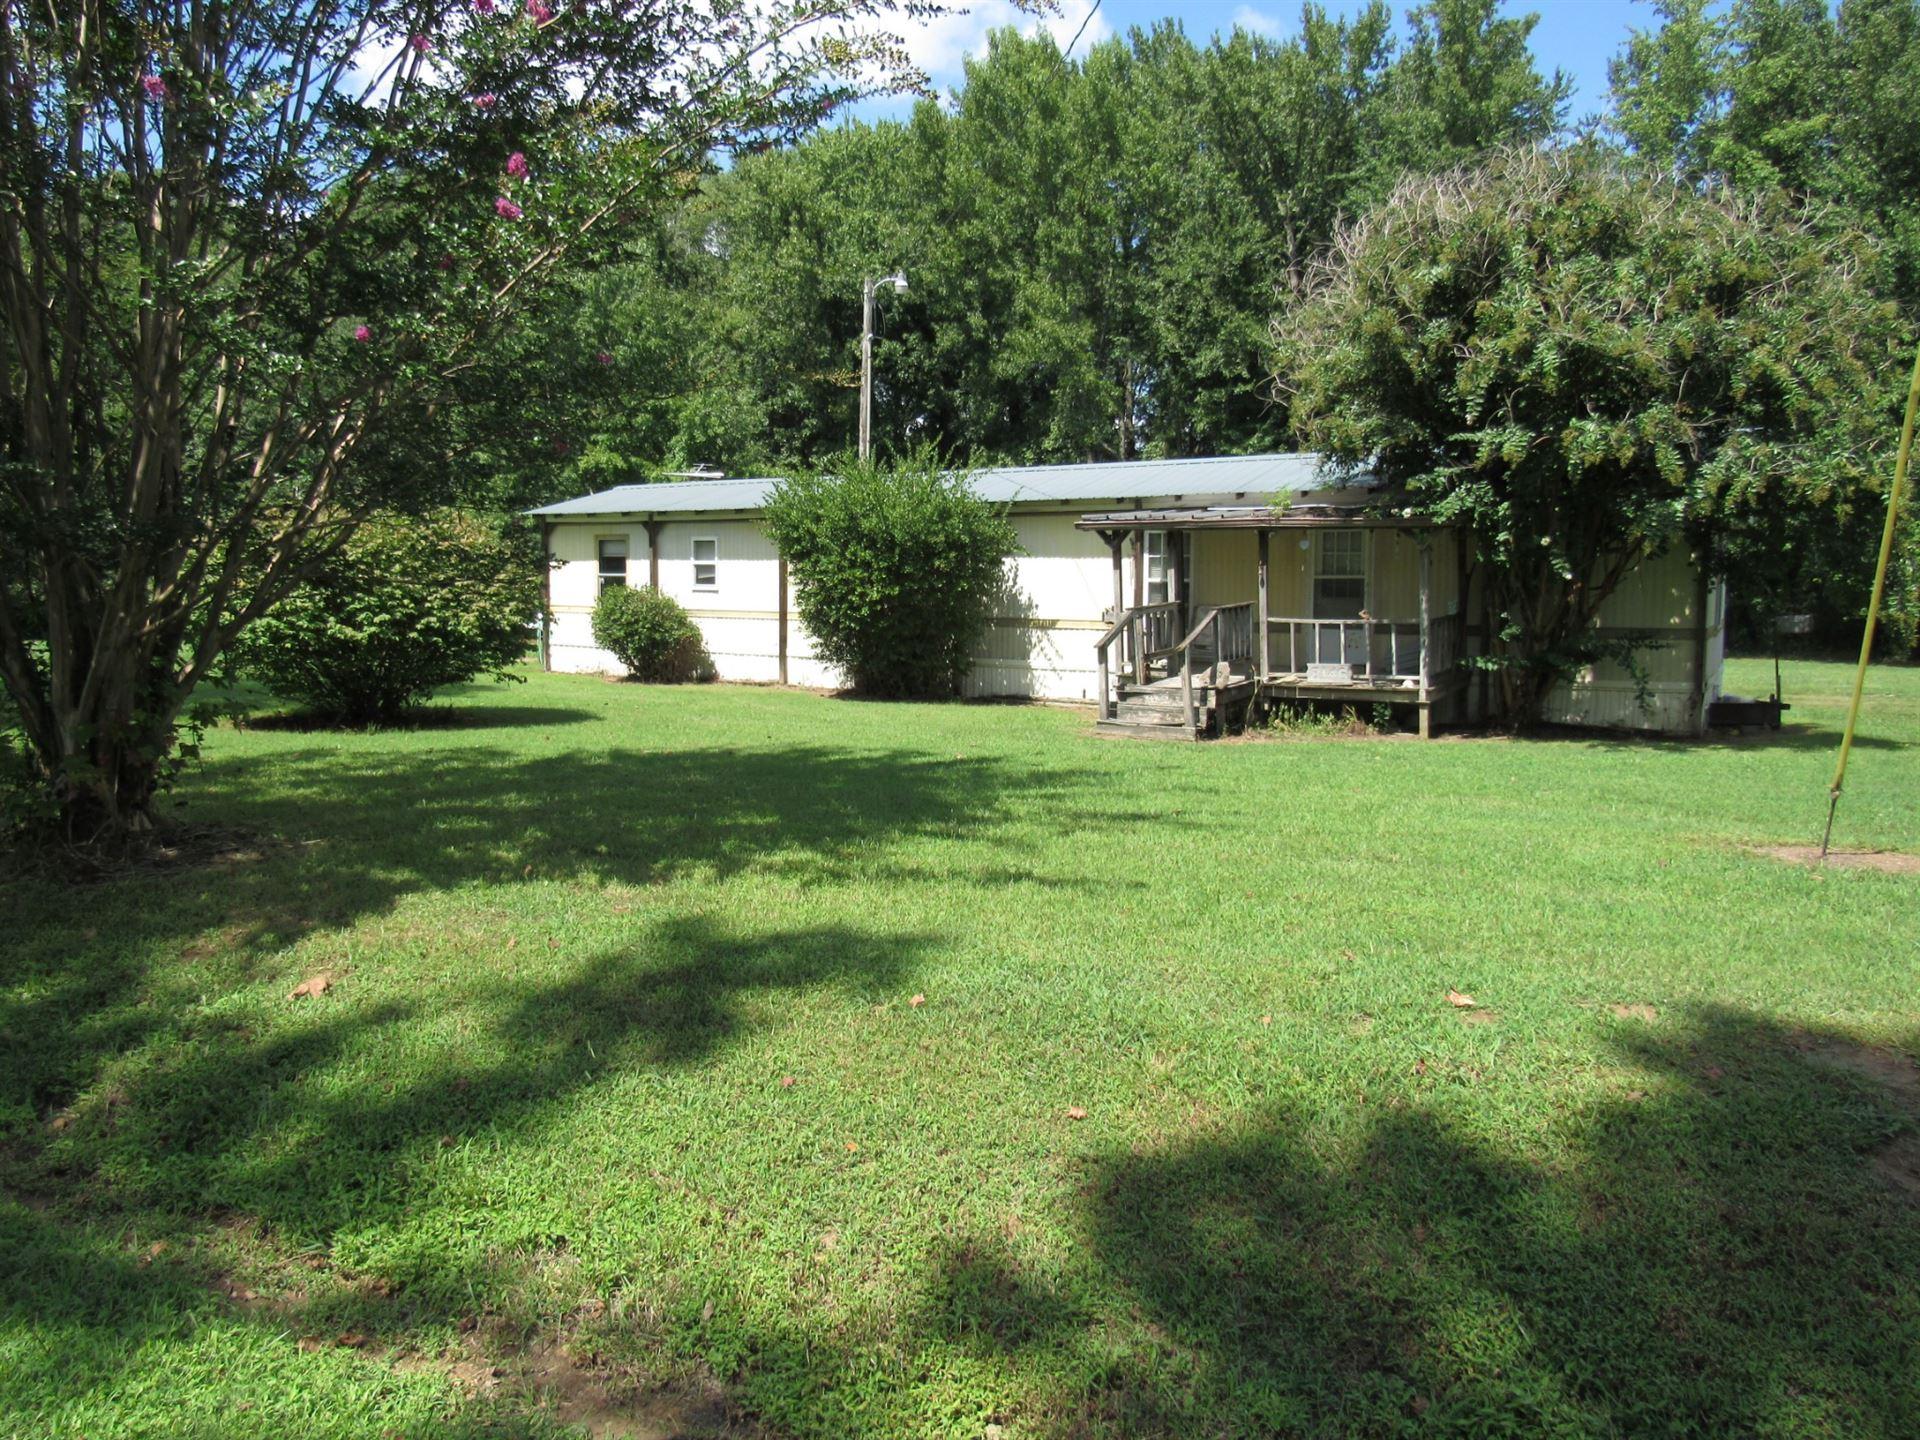 2550 Friendship Rd, Cross Plains, TN 37049 - MLS#: 2288196